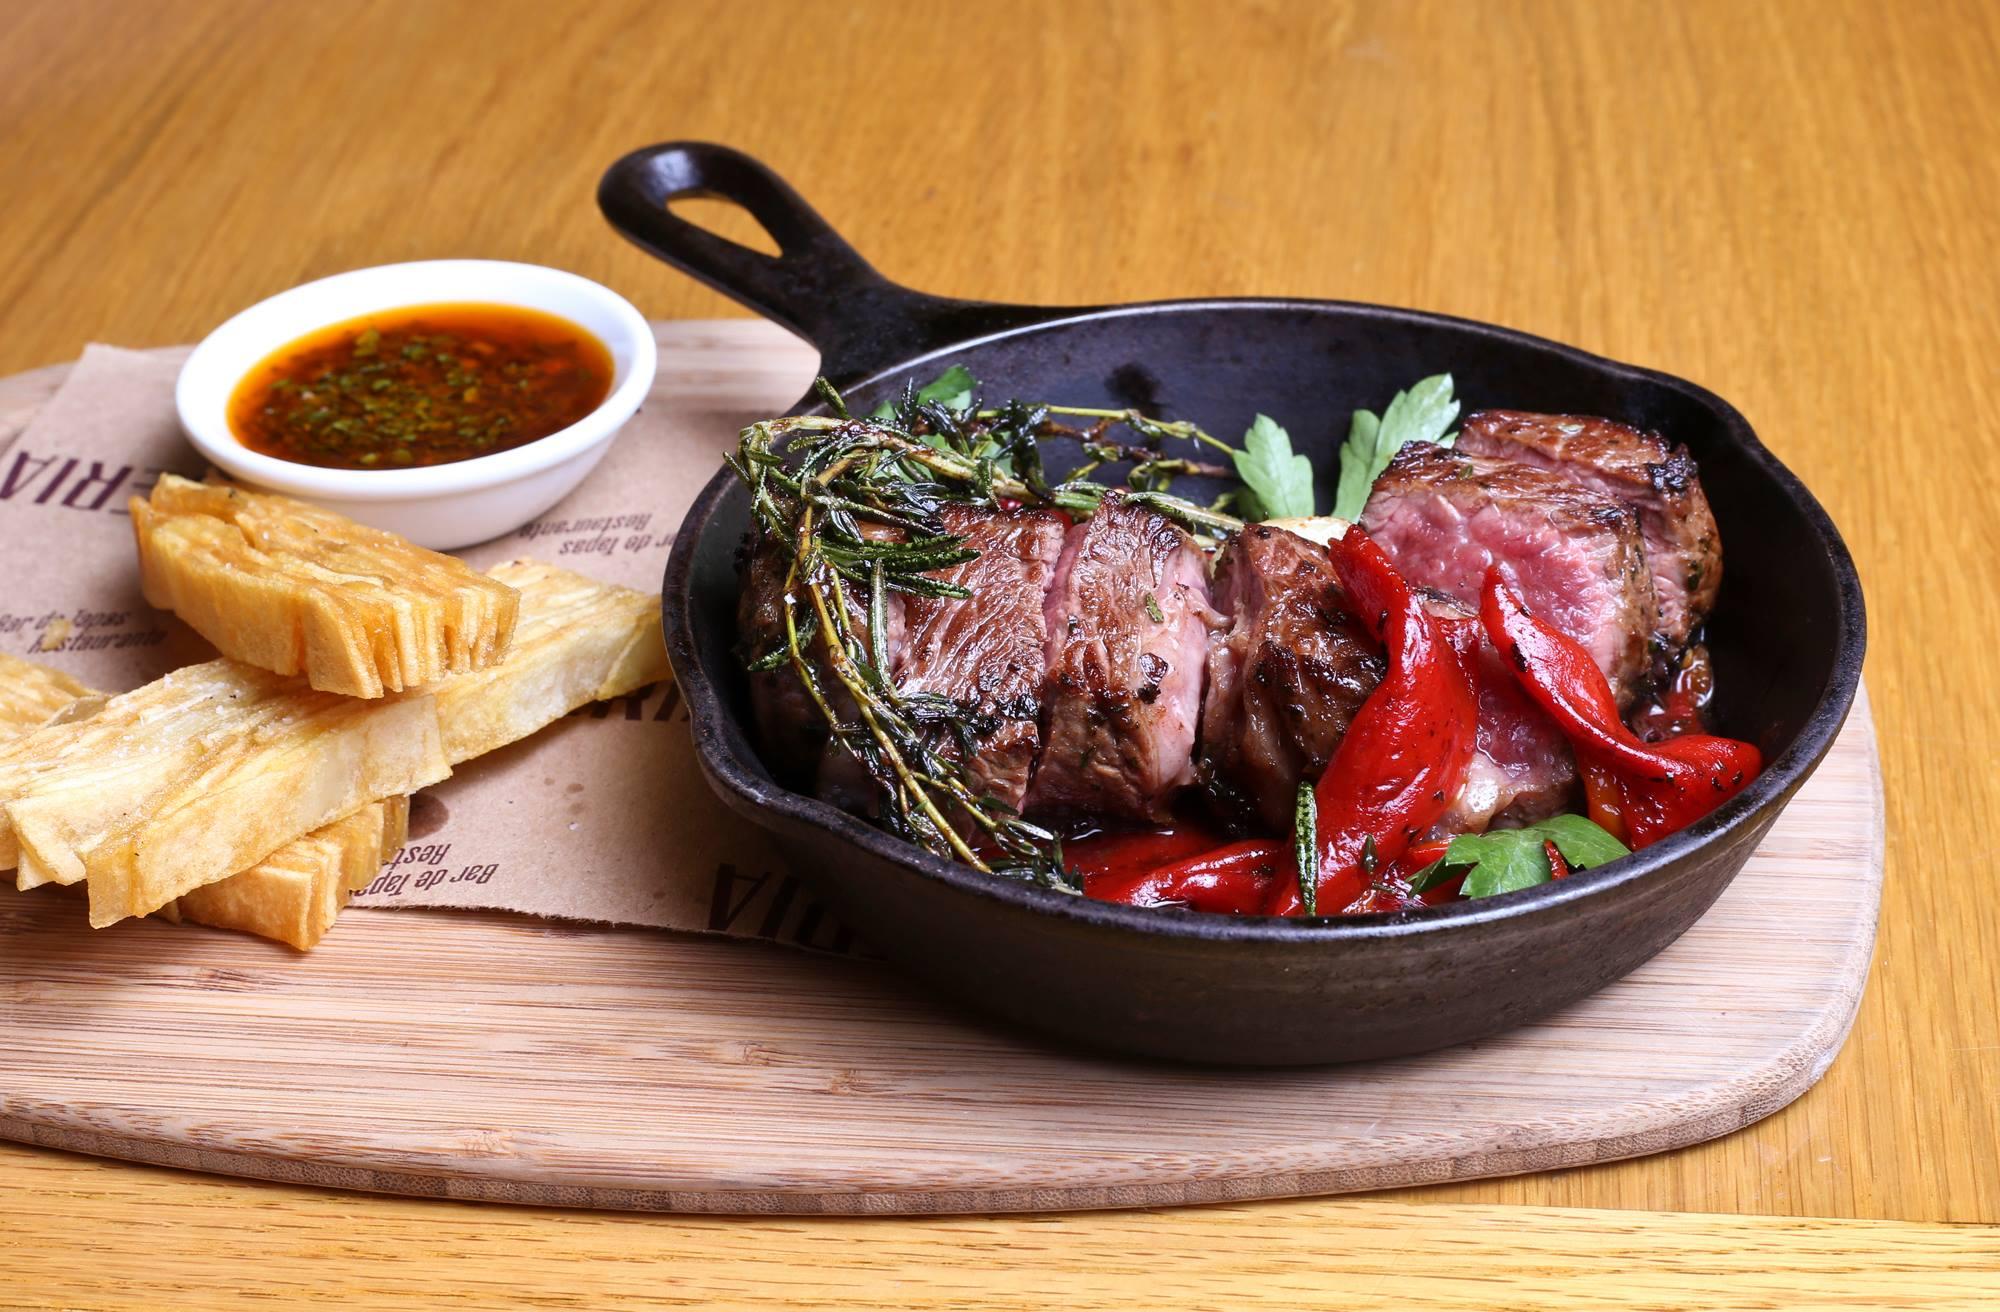 The 10 Best Spanish Restaurants And Tapas Bars In New York City